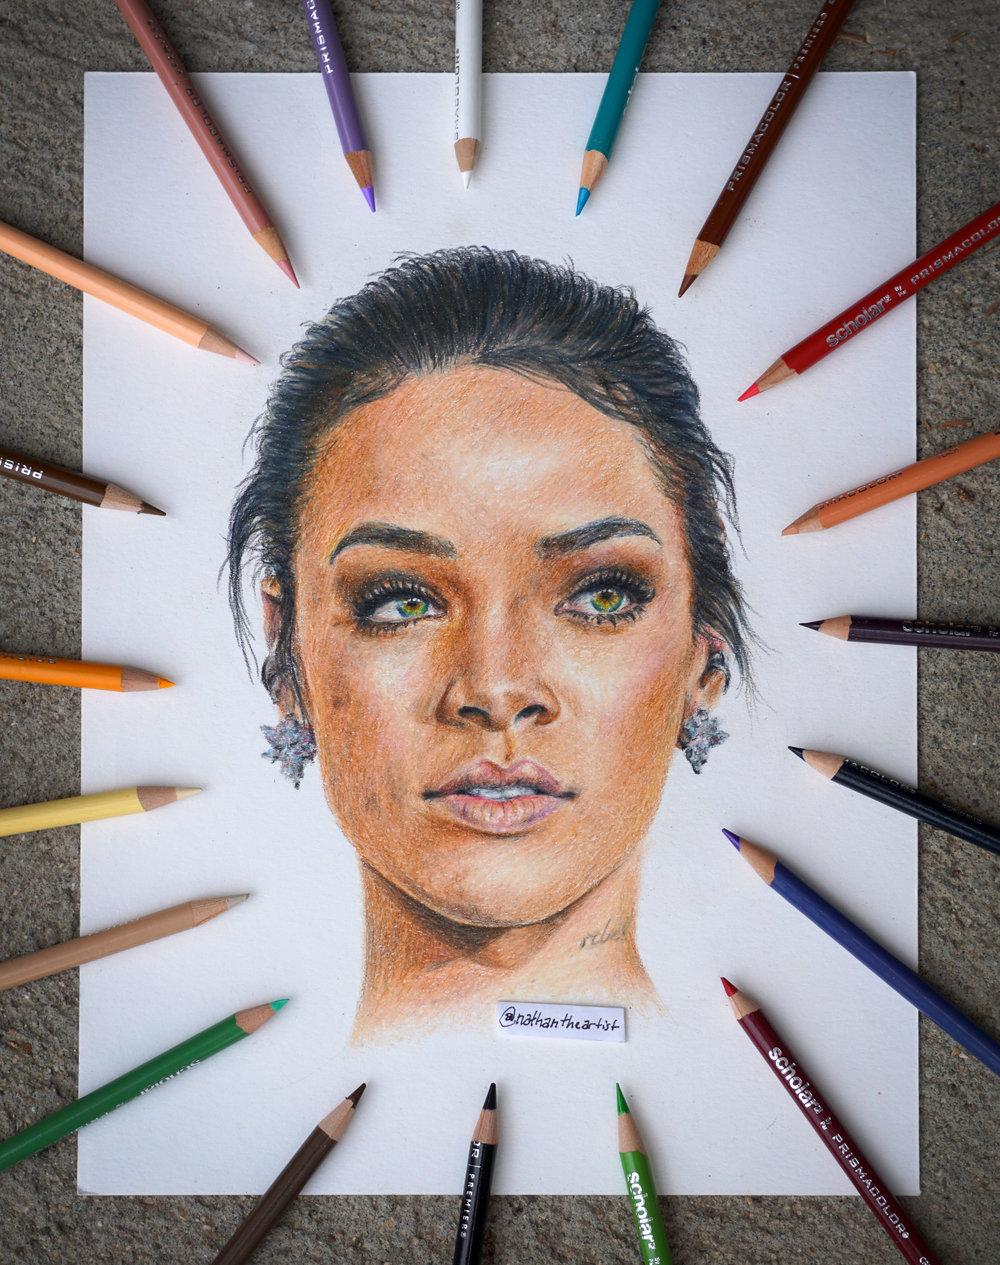 Rihanna - Colored Pencil ■ 11